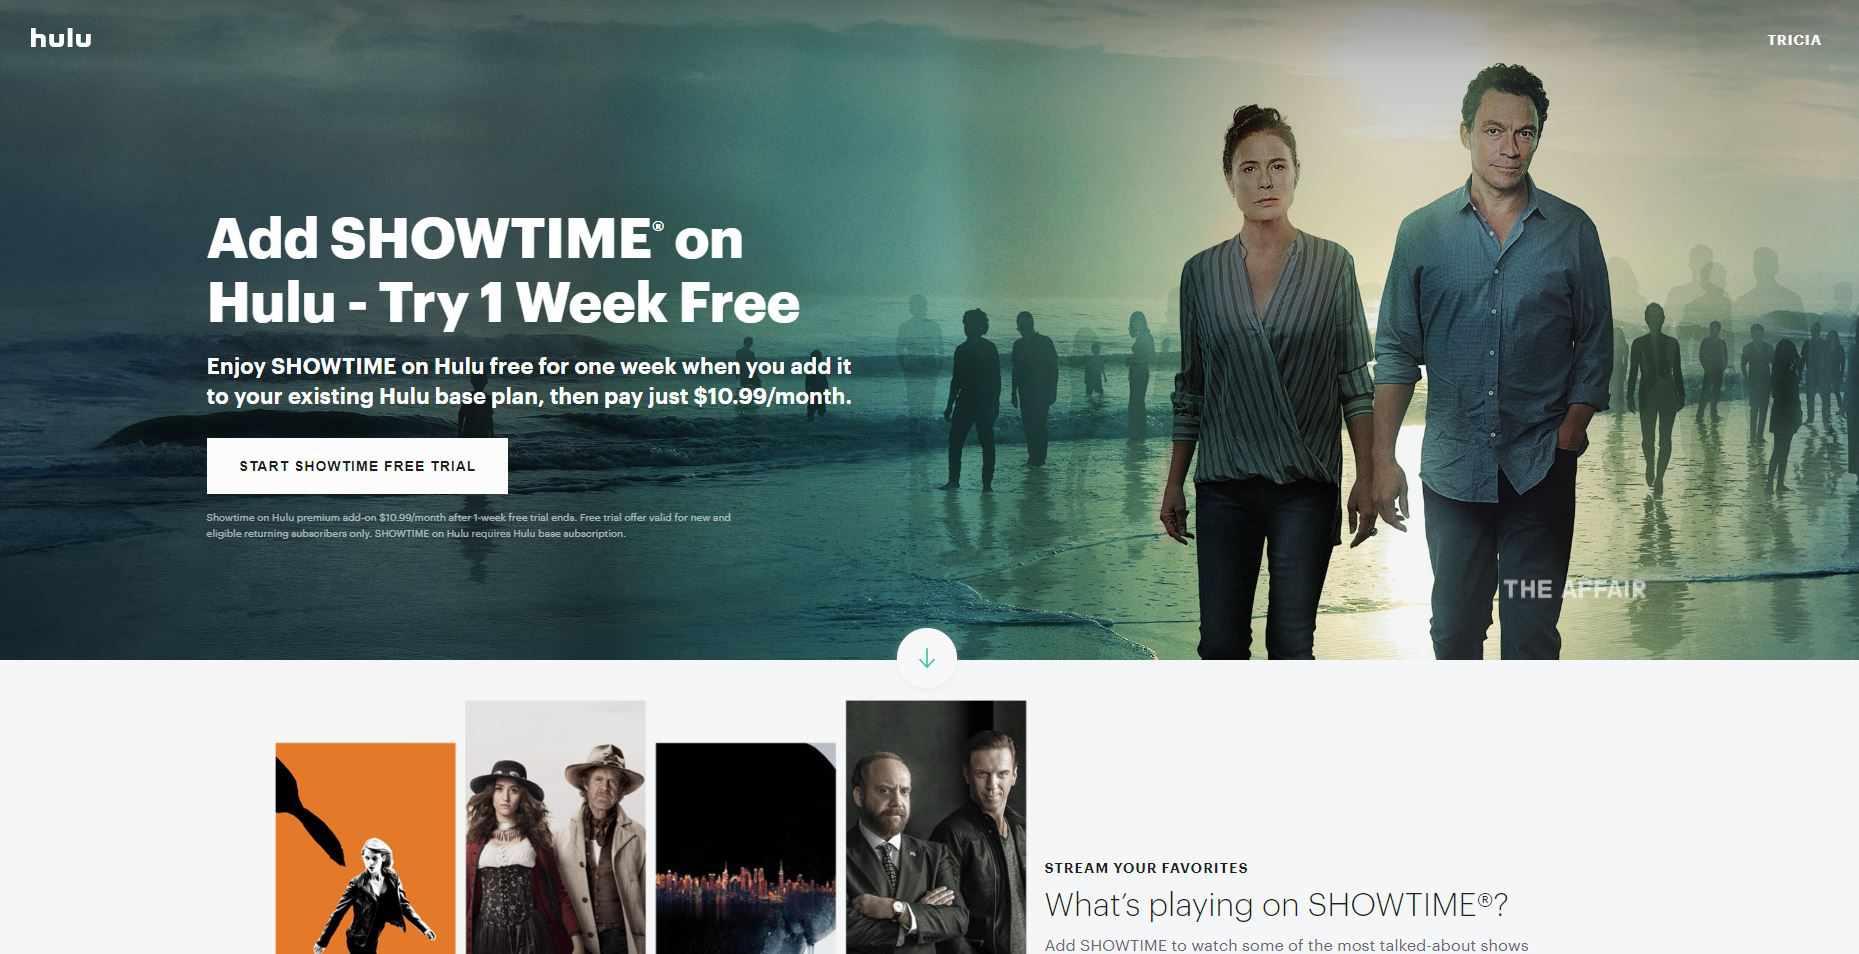 Screenshot showing Showtime add-on for Hulu